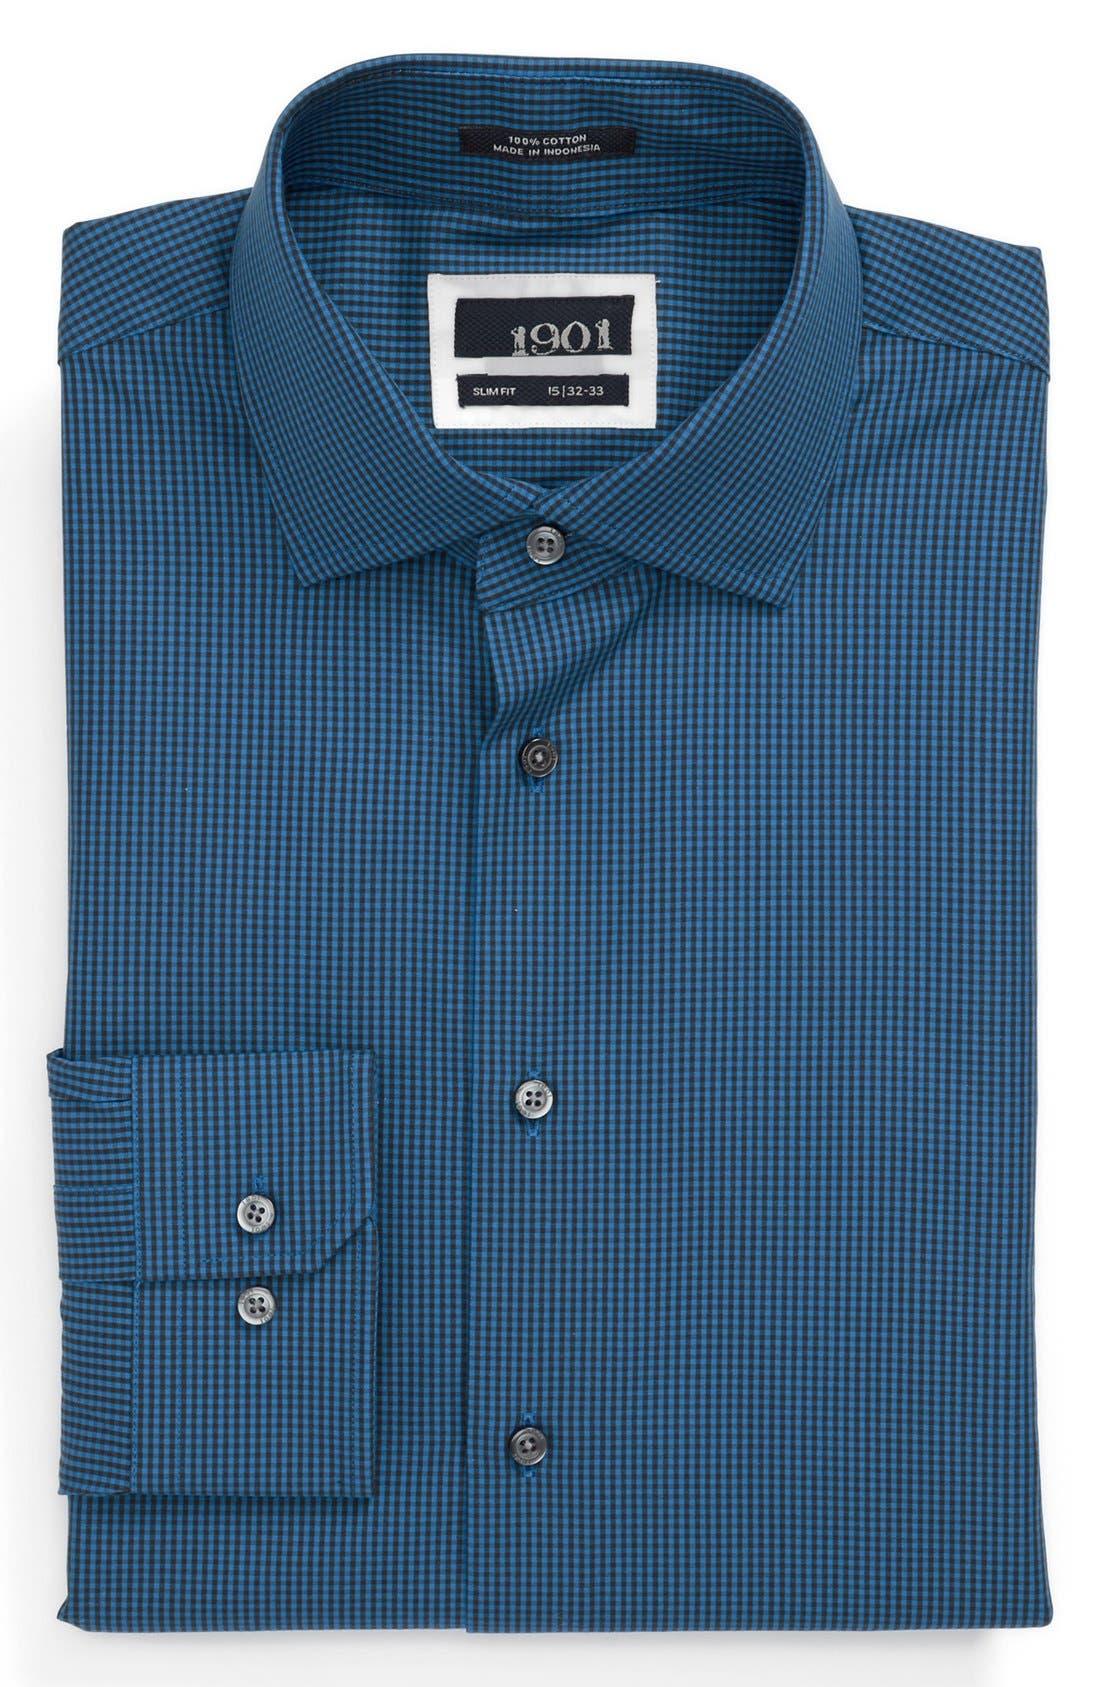 Main Image - 1901 Slim Fit Check Dress Shirt